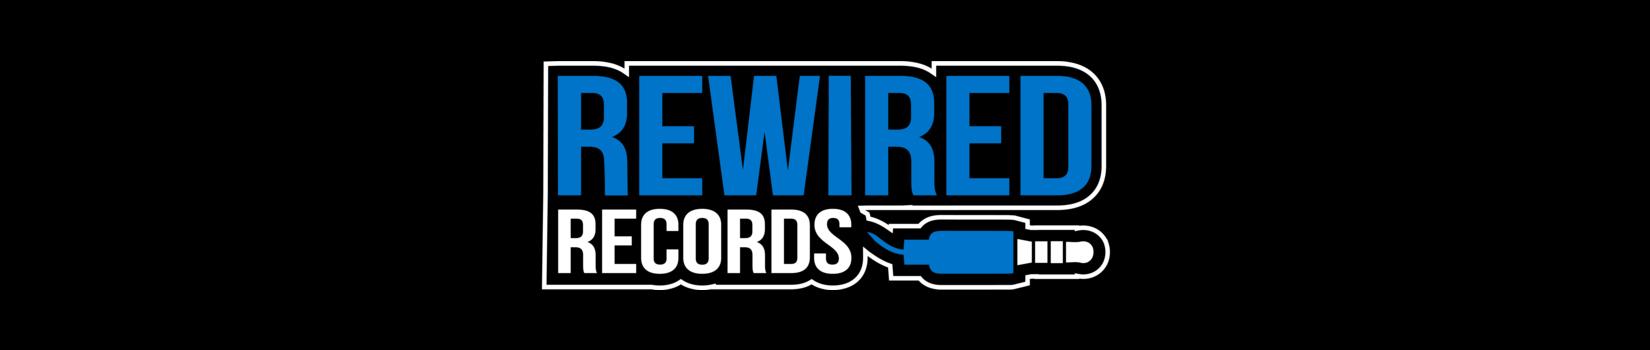 Rewired Records